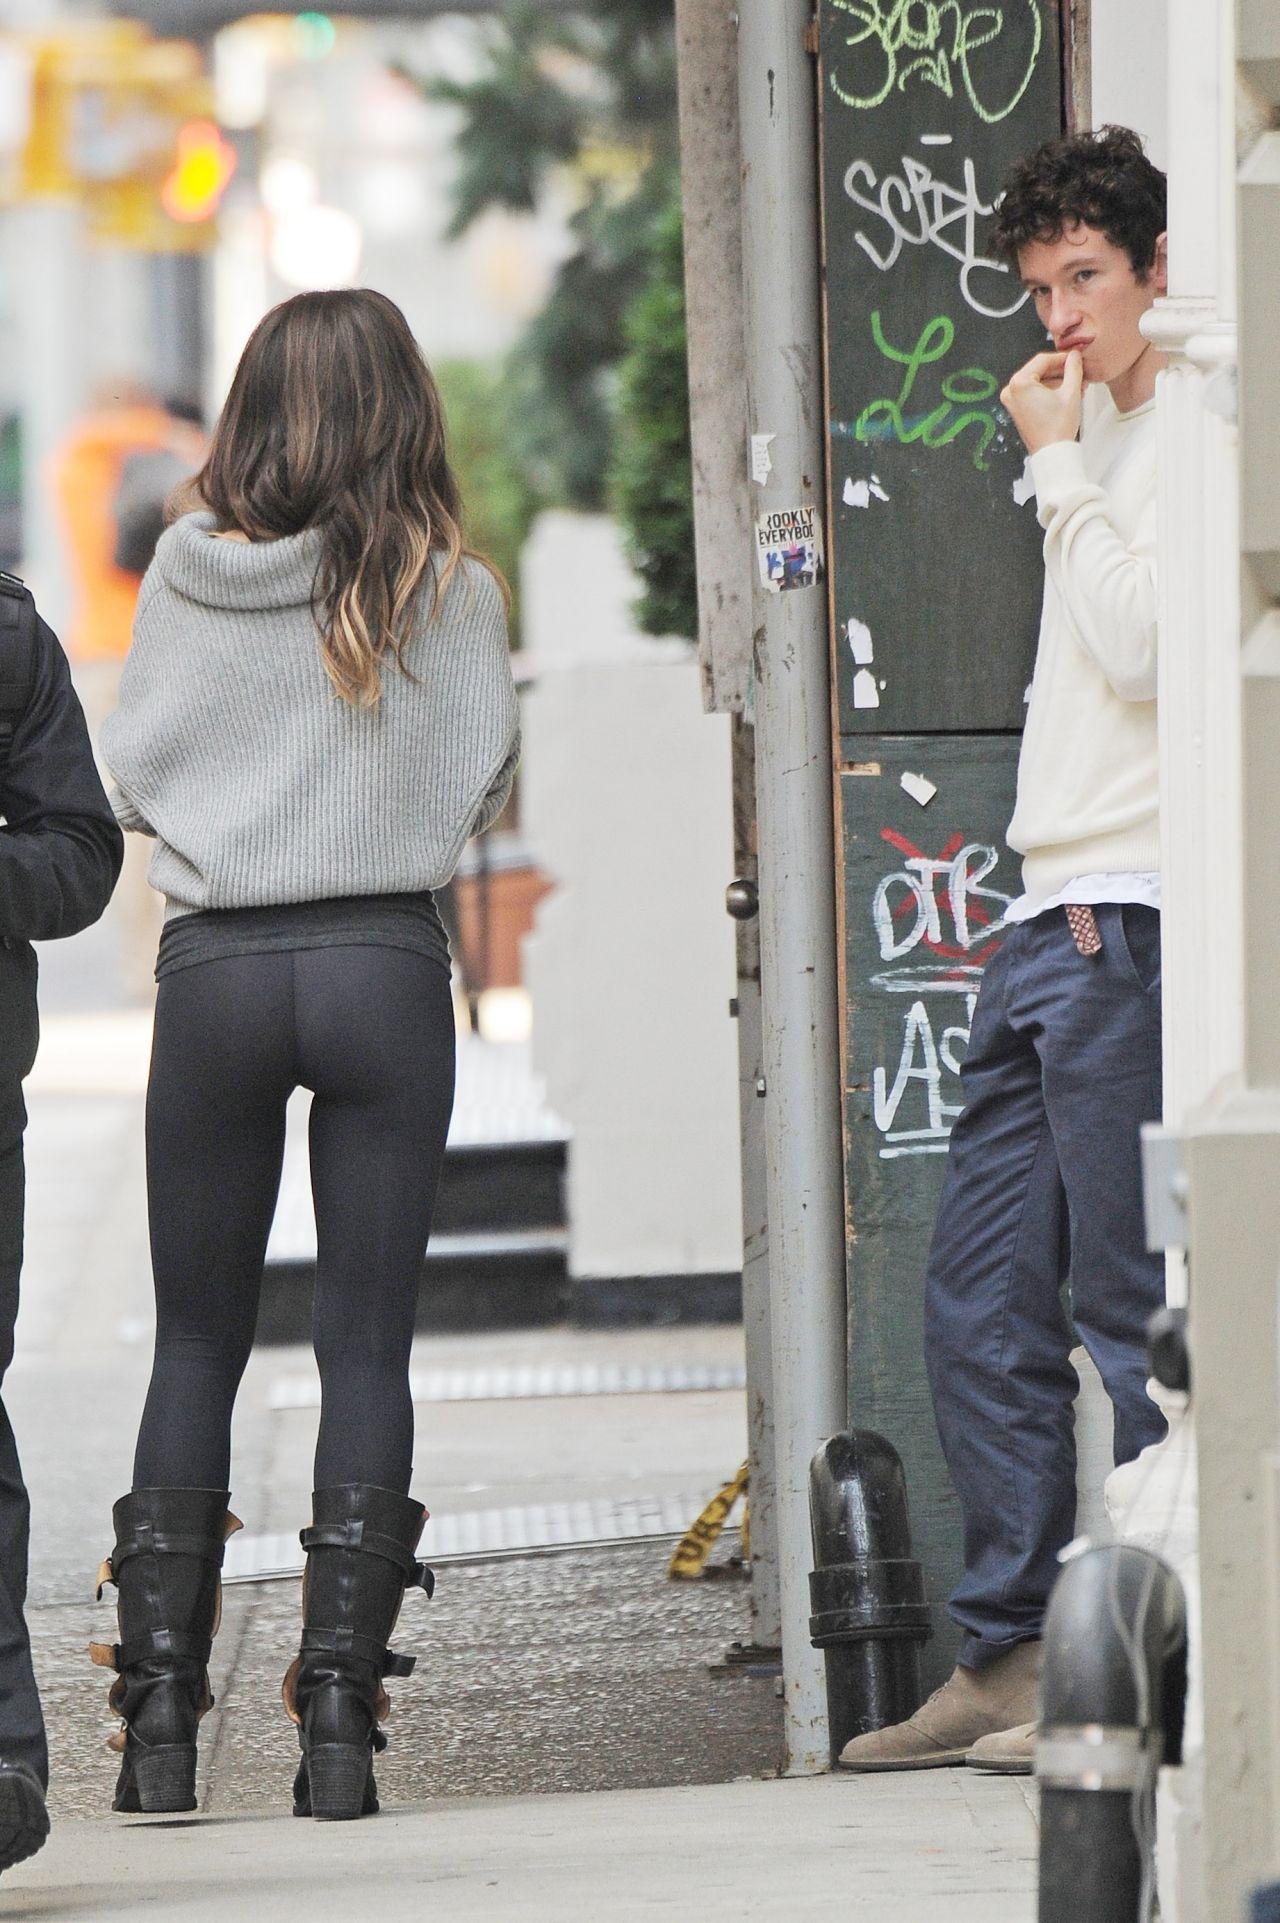 Kate Beckinsale Wearing Leggings Rehearsing On Set In